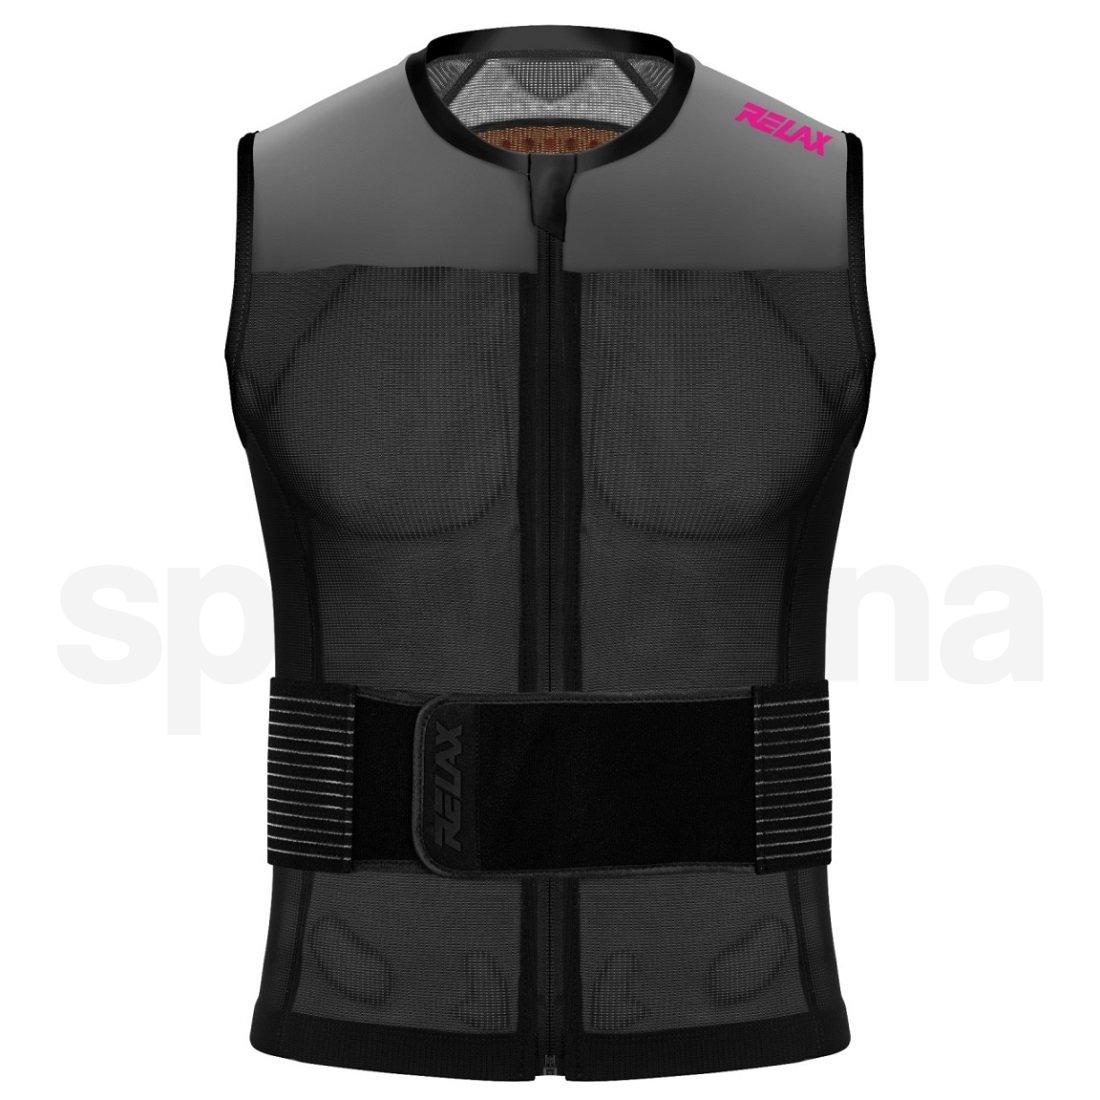 Chránič páteře Relax Speedmaster Evo ROP03C - černá/šedá